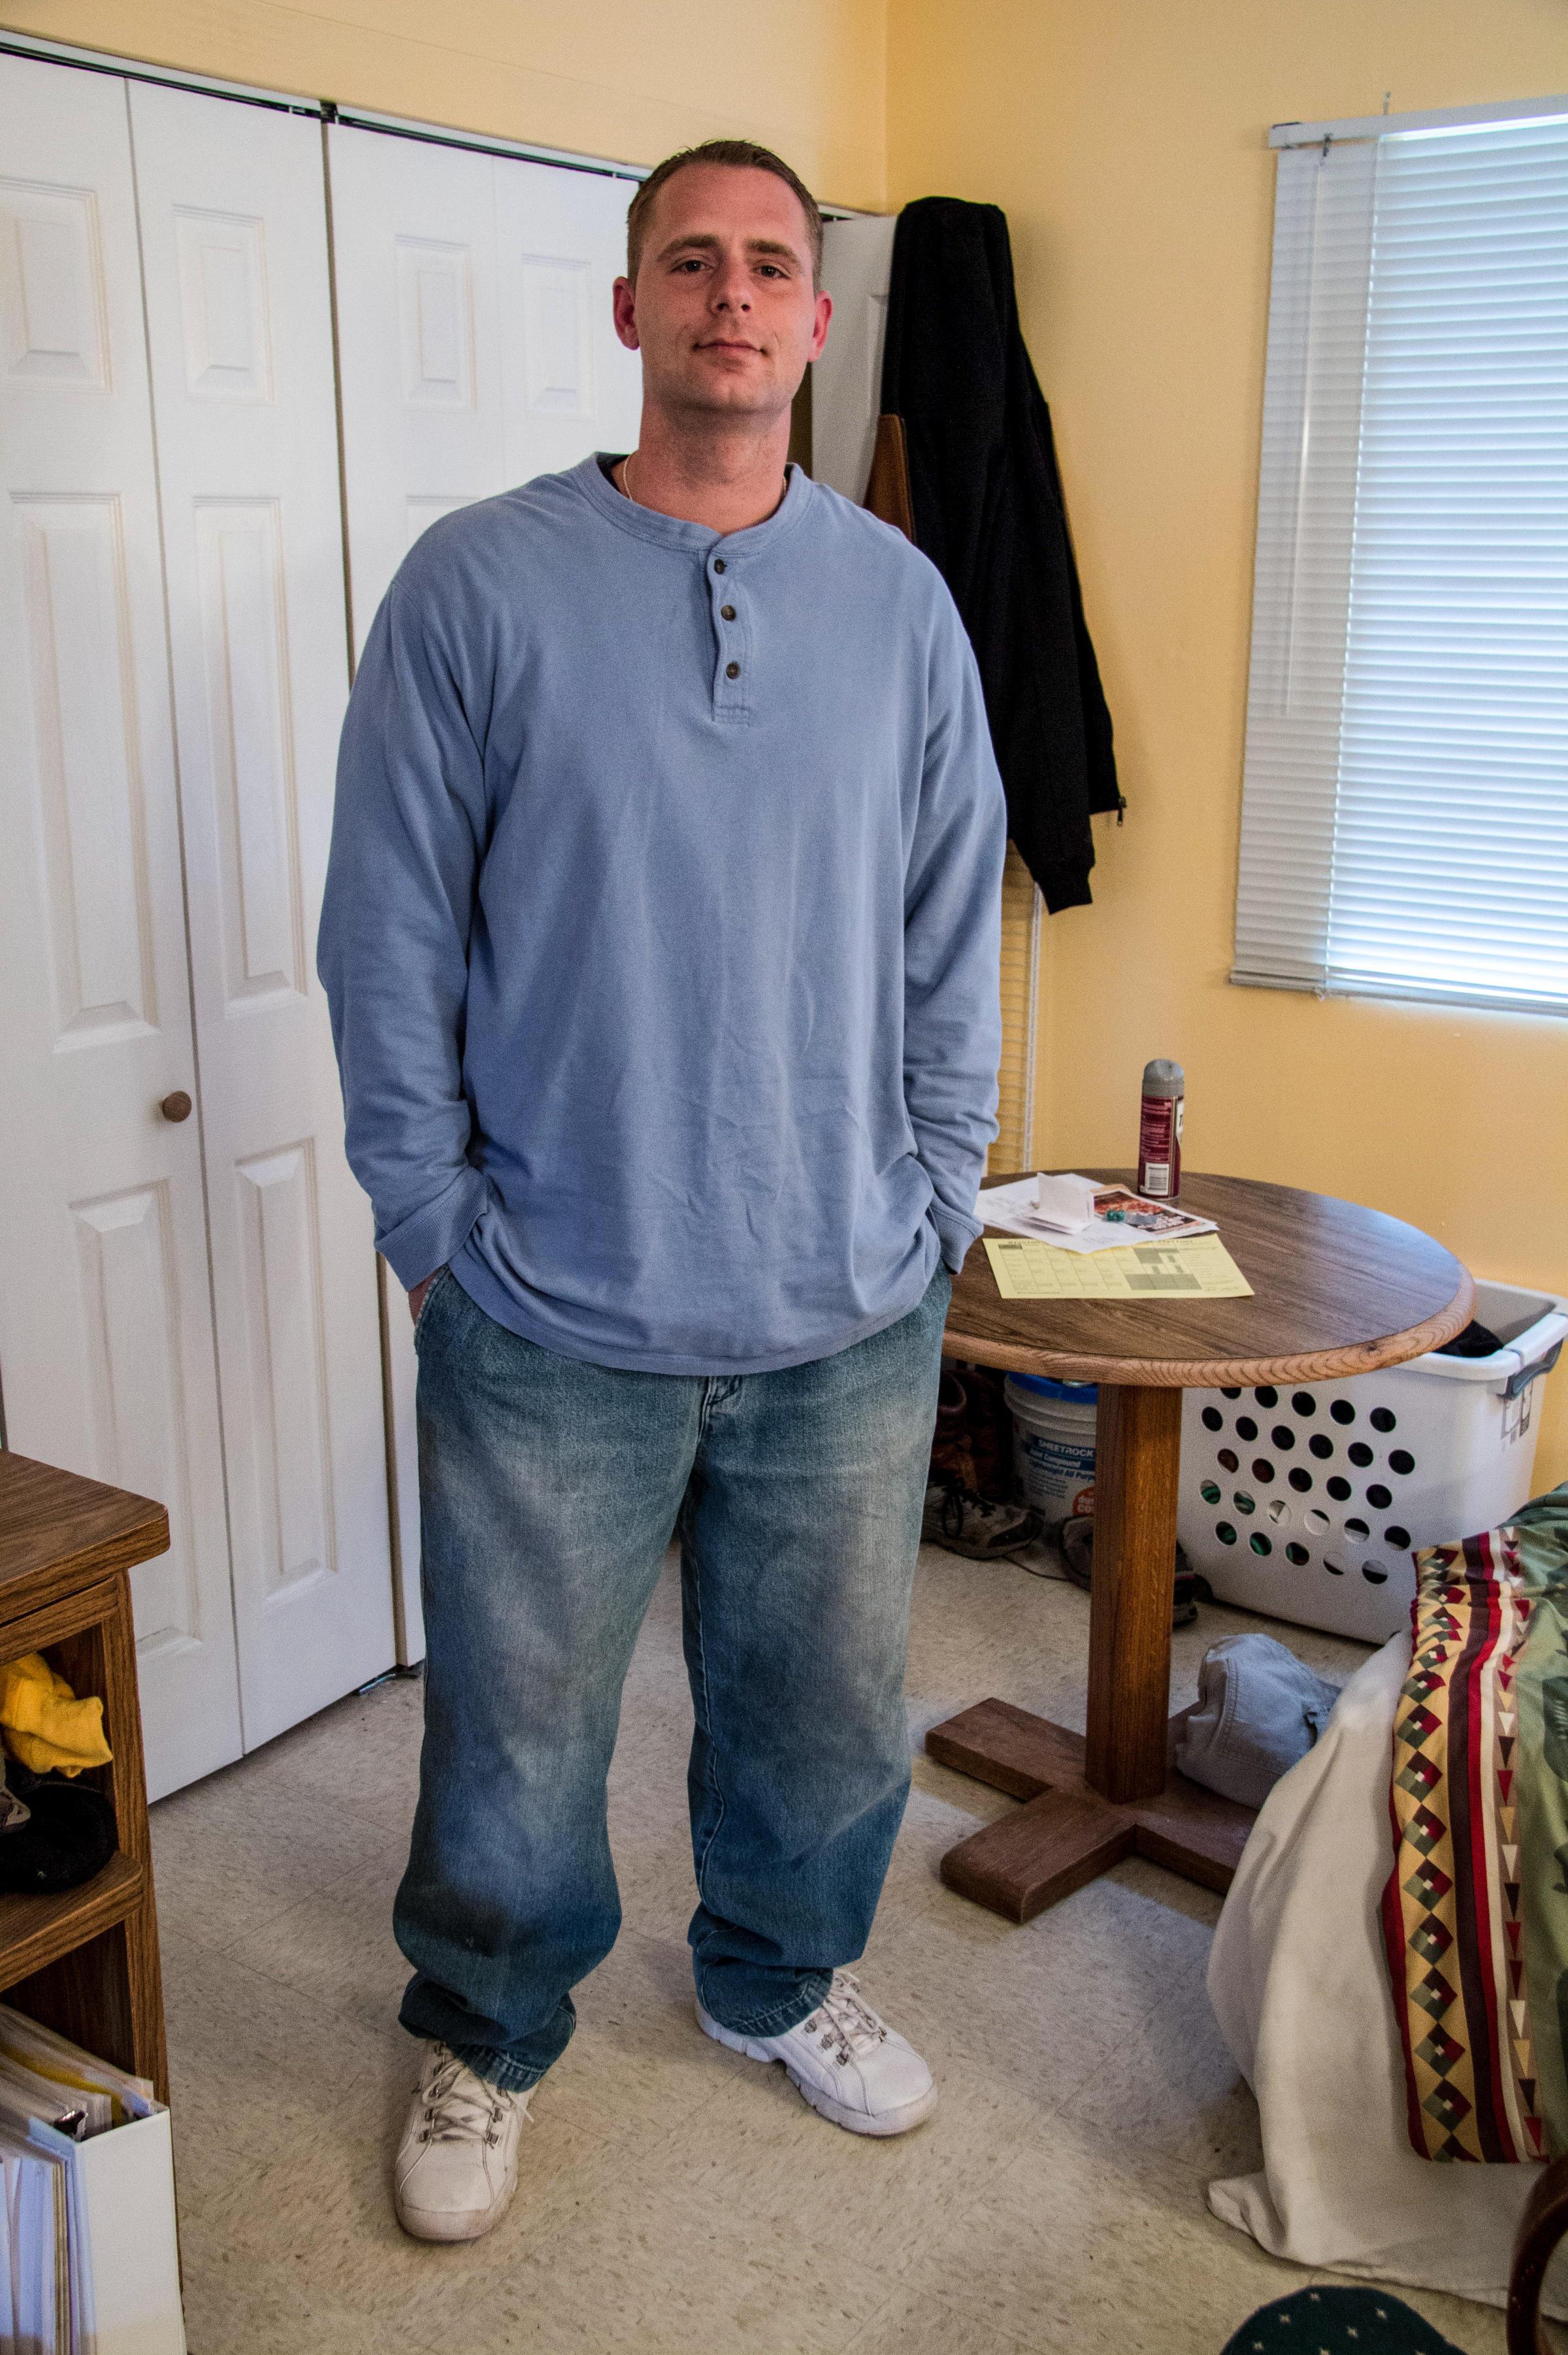 Jason Lynch has battled opioid use for 22 years, feeding his addiction ...